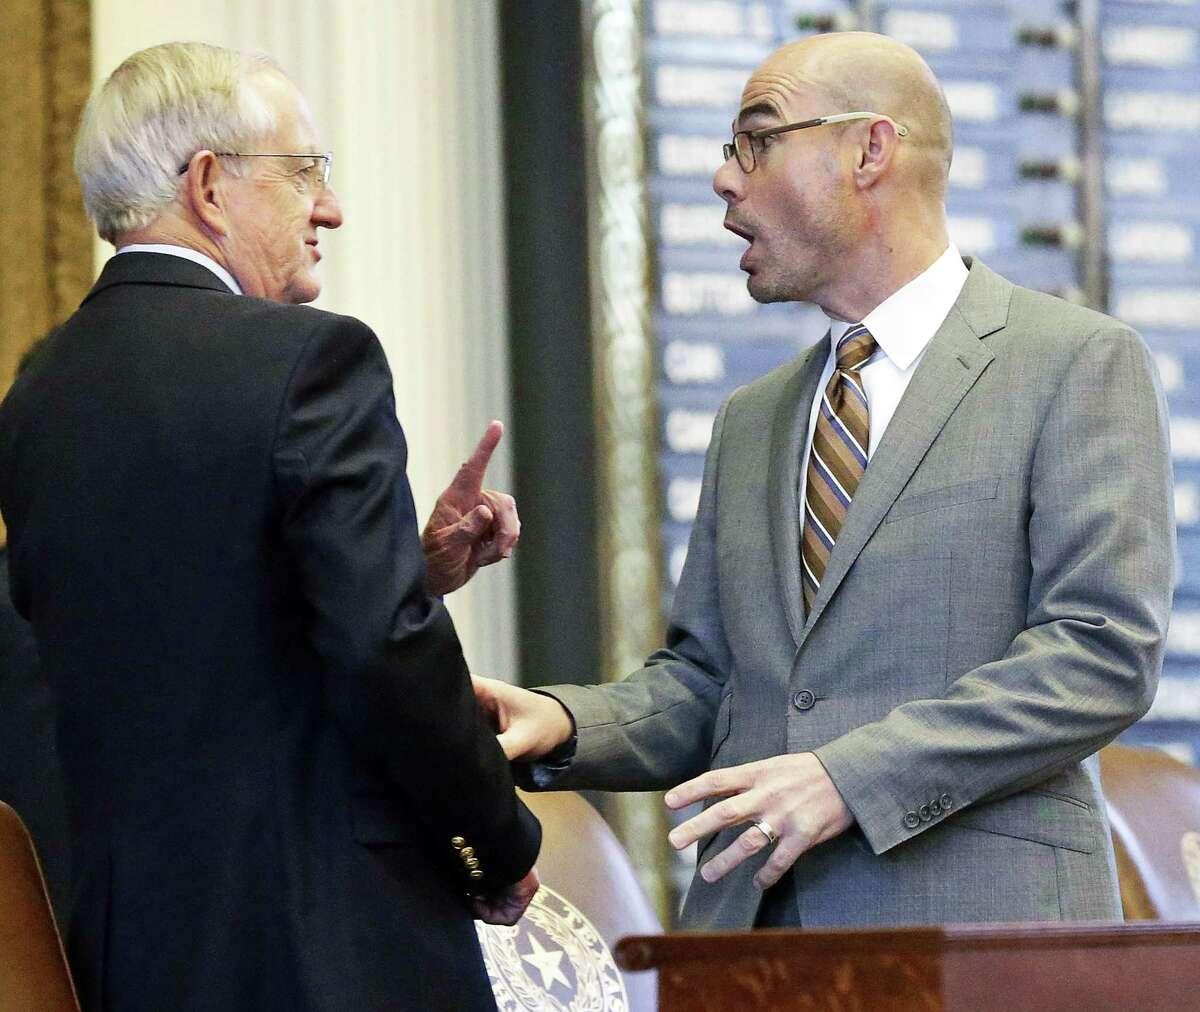 Represetative Dennis Bonnen, R-Angleton, (right) engages with Representative John Smithee, R-Amarillo, as members debate legislation in the House of Representatives on April 27, 2017.